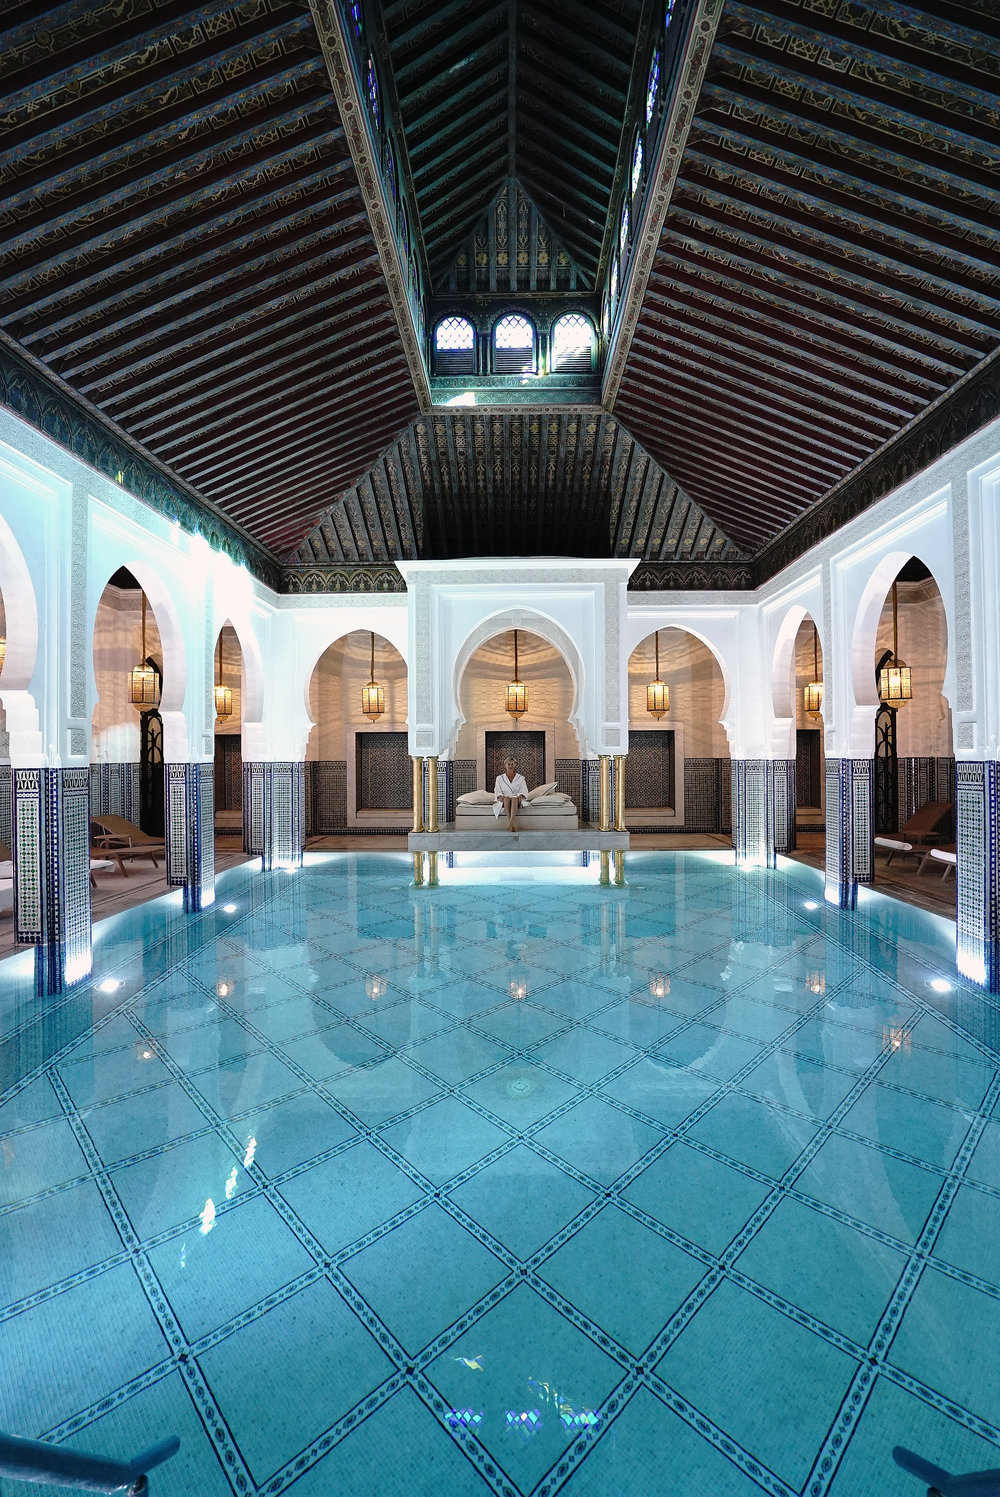 La Mamounia Morocco Indoor Swimming Pool 6.jpg